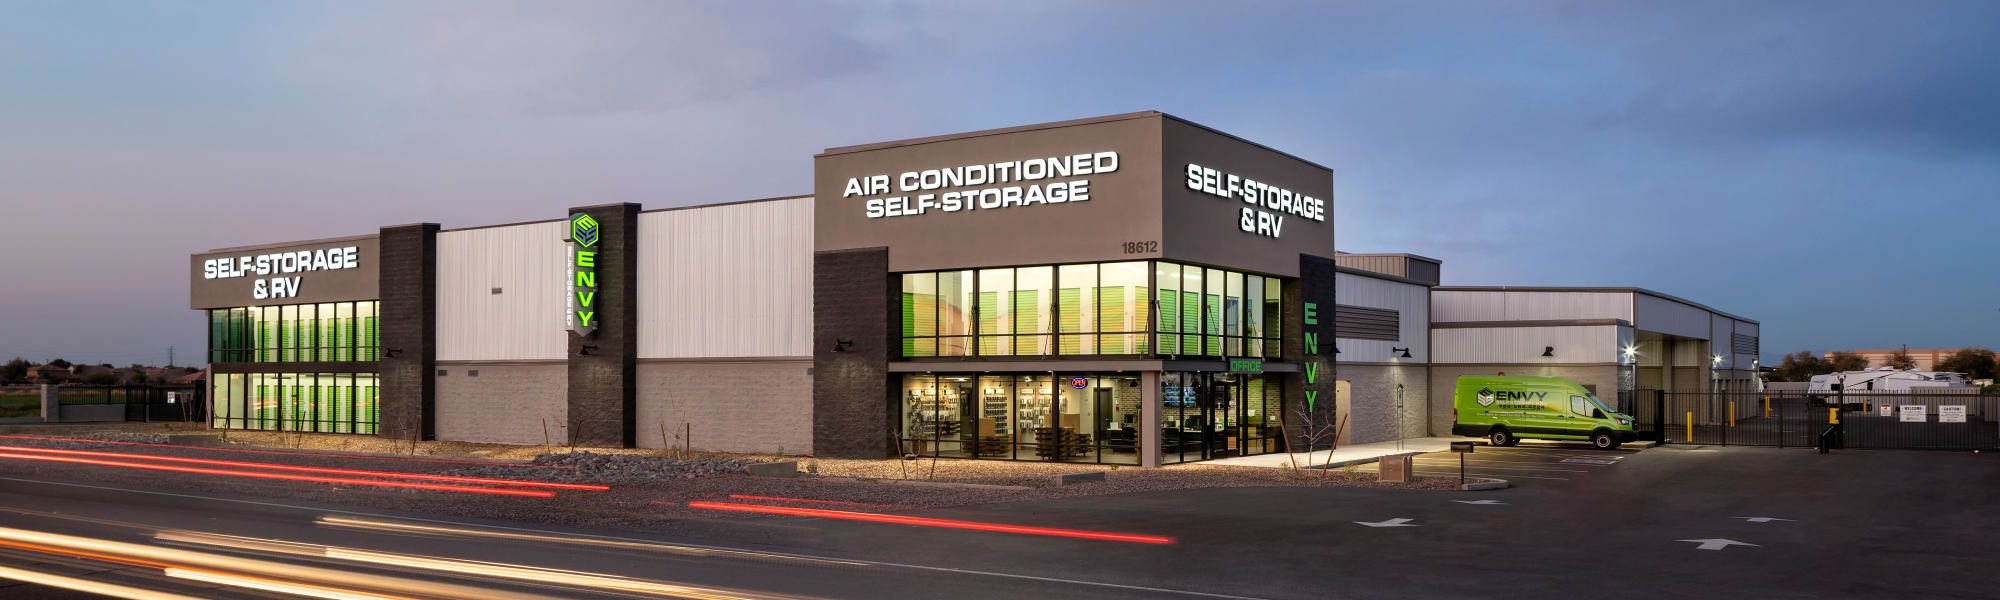 Envy Self Storage & RV facility, managed by 180 Self-Storage